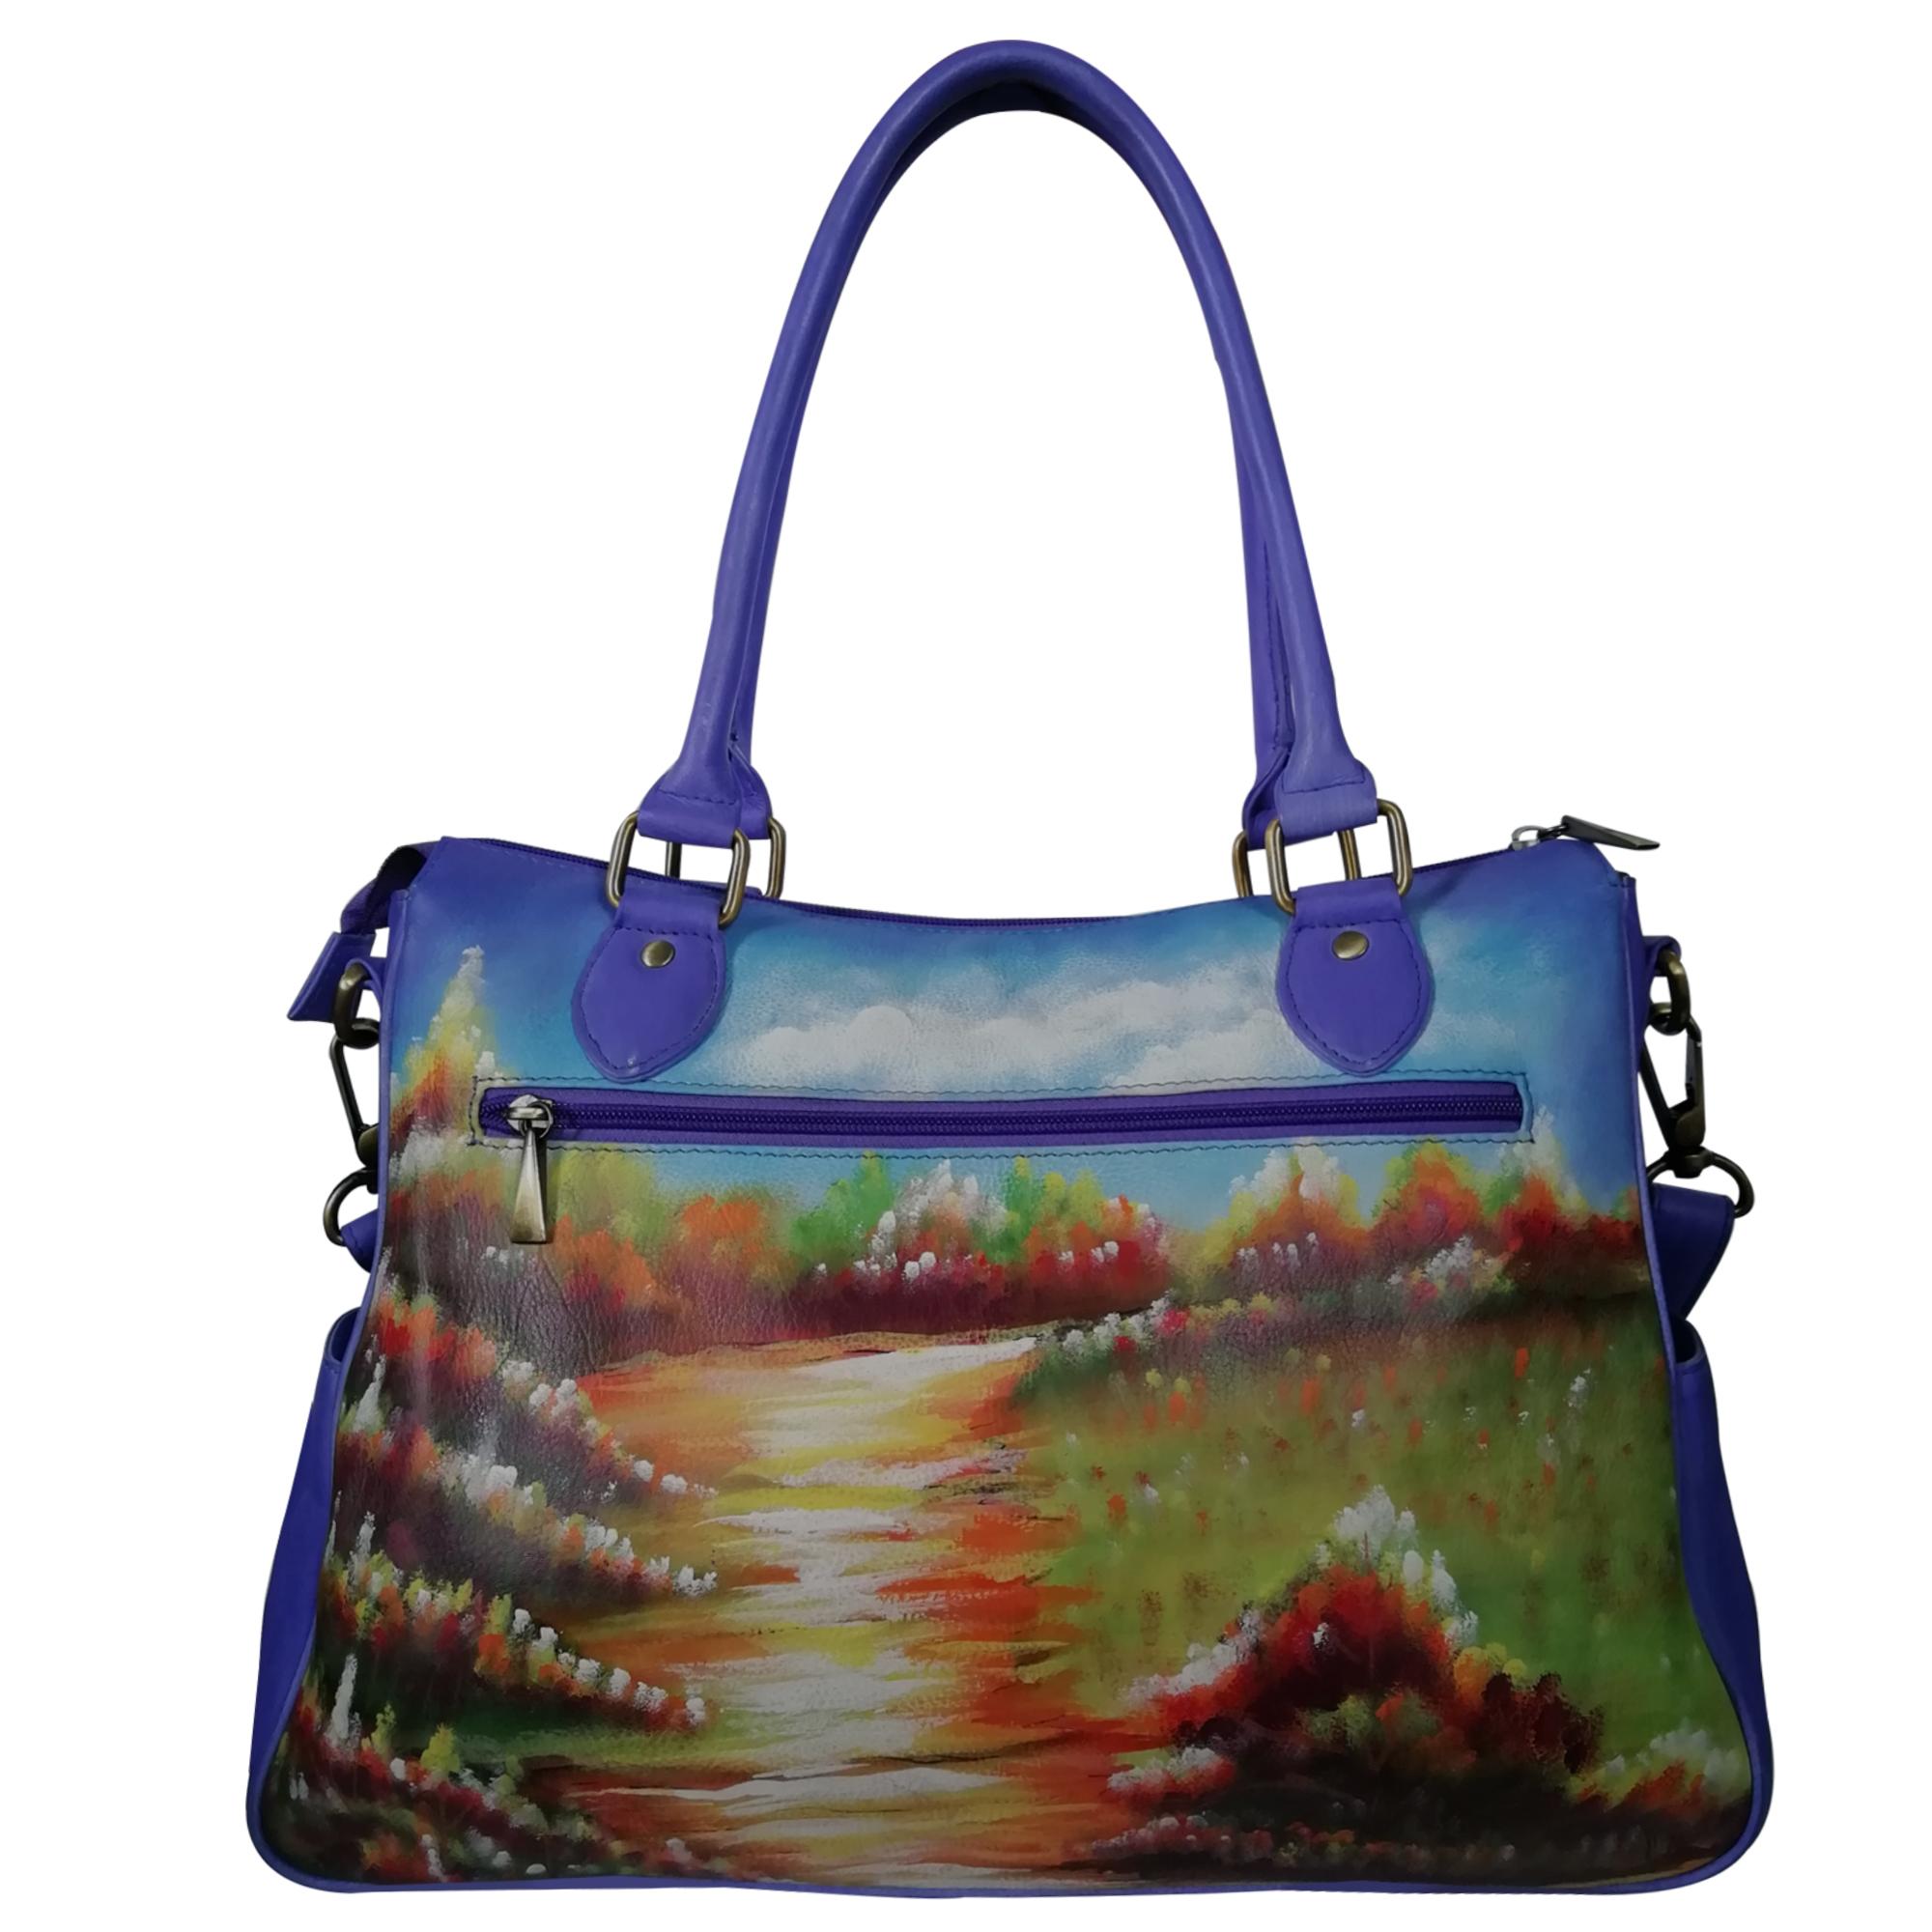 New Hand Painted Leather Shoulder Handbag For Women